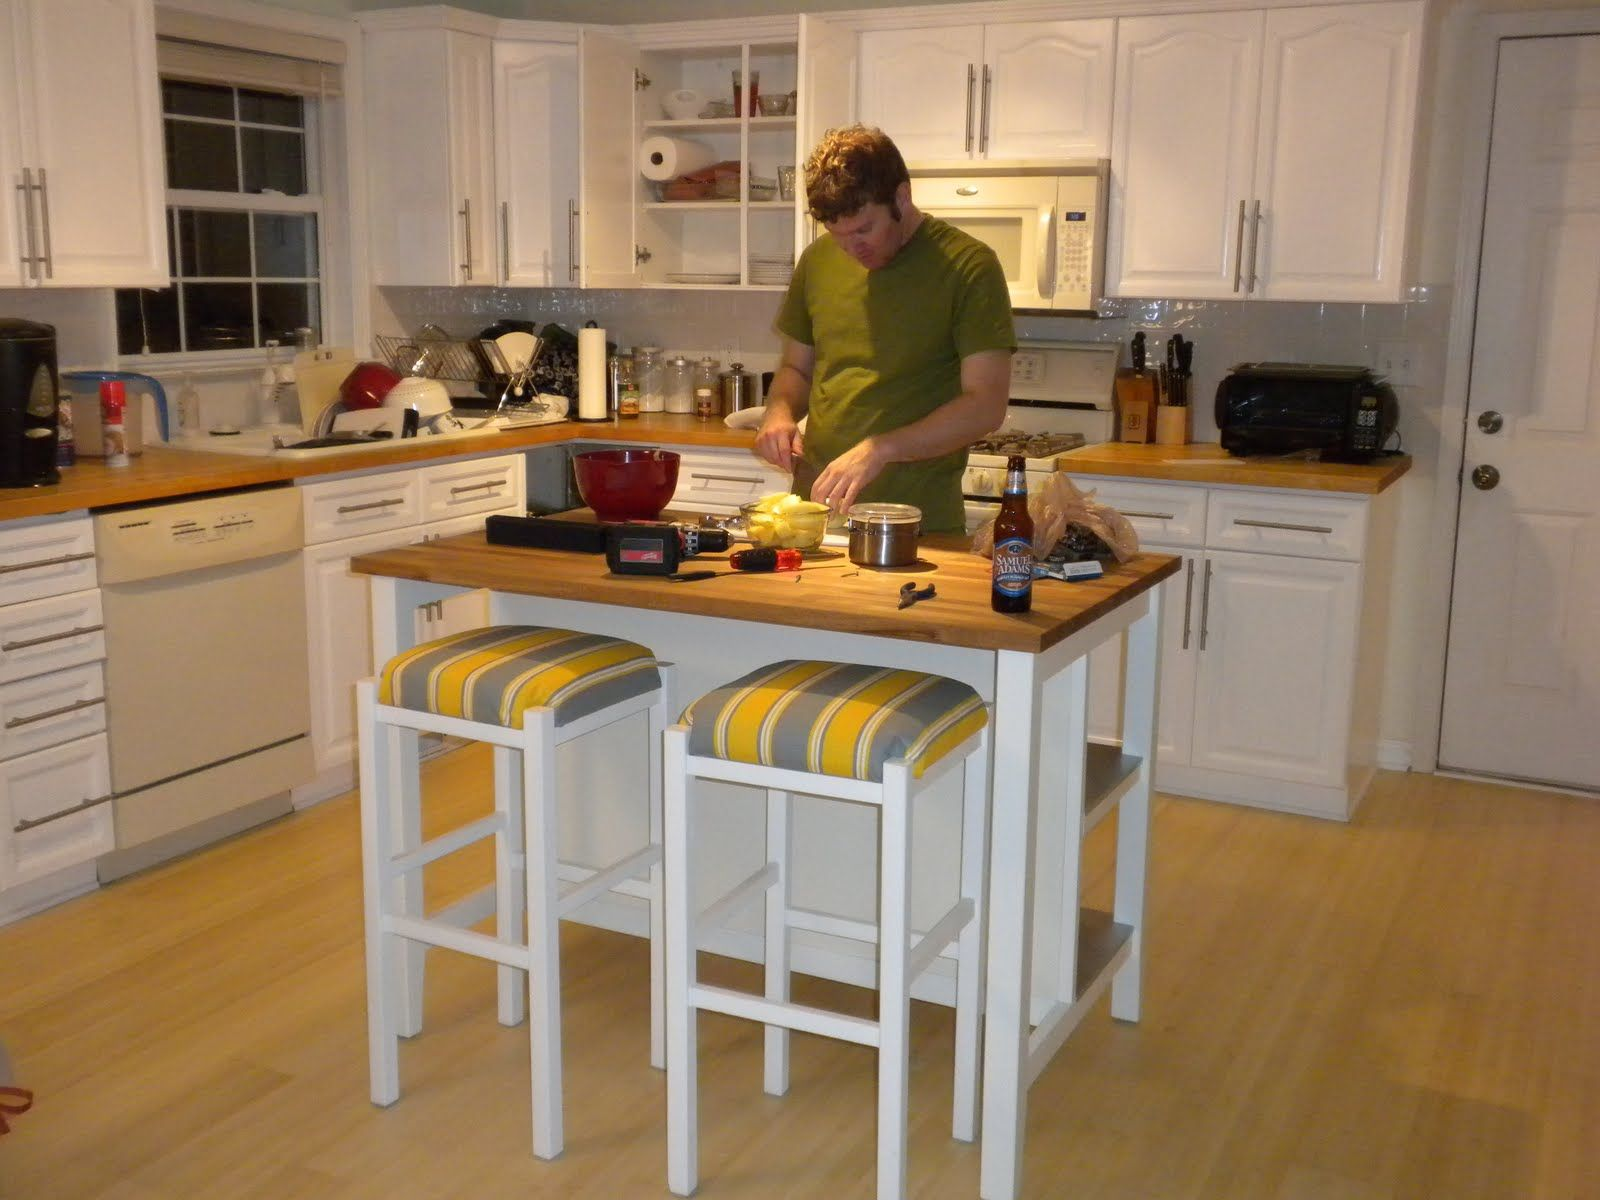 Kitchen Island With Breakfast Bar Ikea Google Search